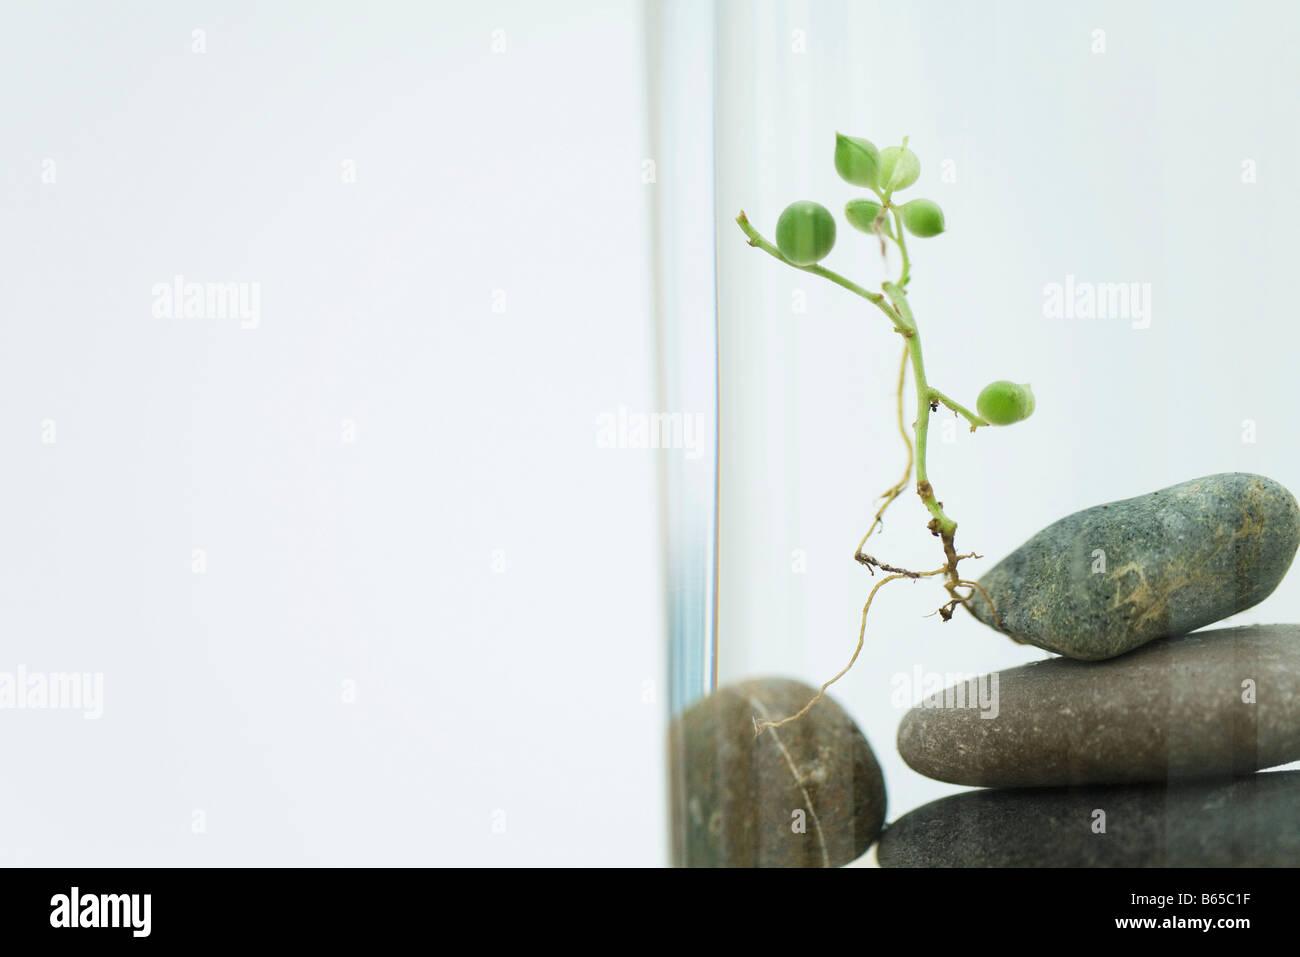 Uprooted plant (Senecio Rowleyanus) on top of pile of rocks - Stock Image